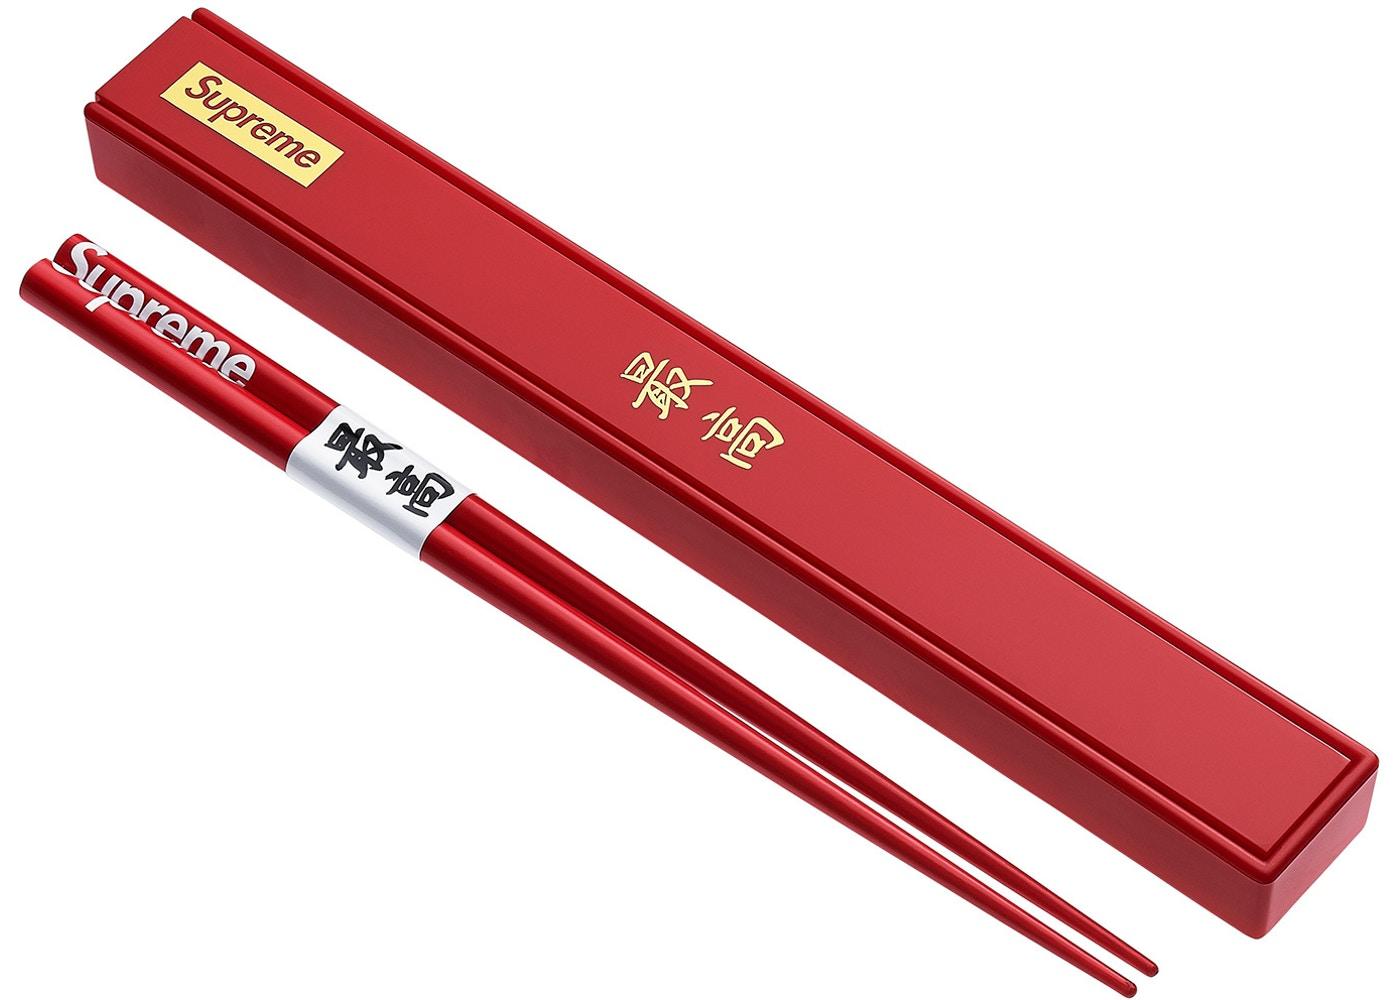 Chopsticks clipart chopstick chinese. Supreme set red